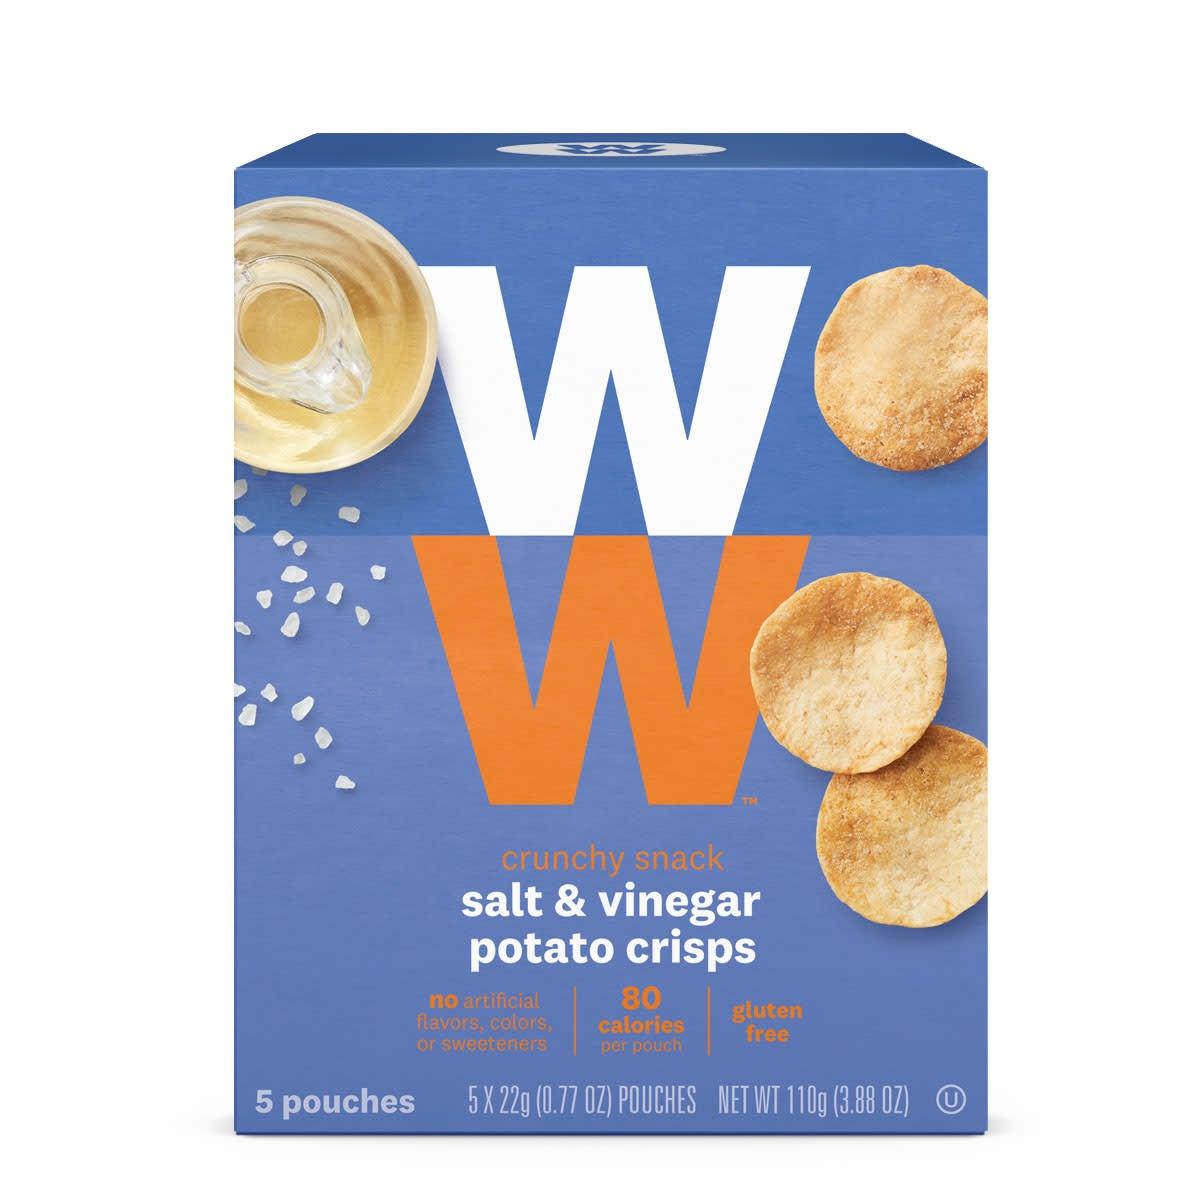 Salt and Vinegar Potato Crisps,  front of box, 80 calories, 5 pouches, gluten free crunchy snack